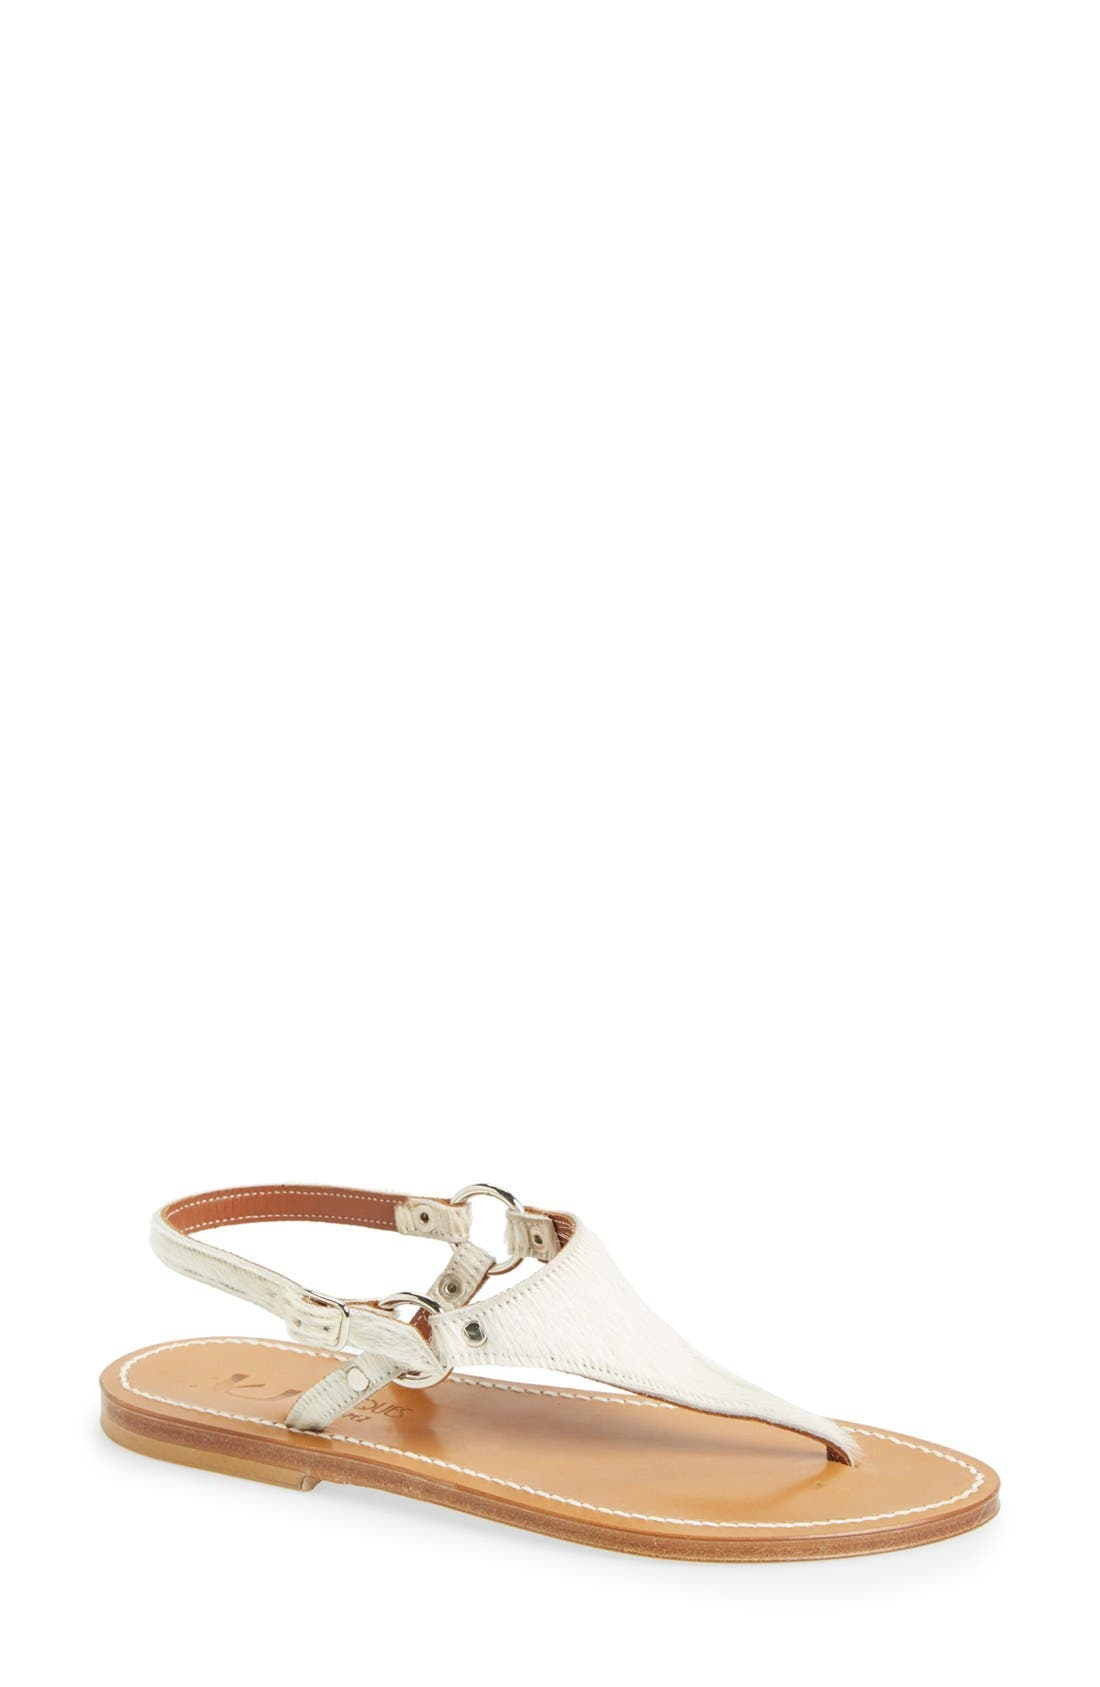 Alternate Image 1 Selected - K.Jacques St. Tropez Slingback Thong Sandal (Women)